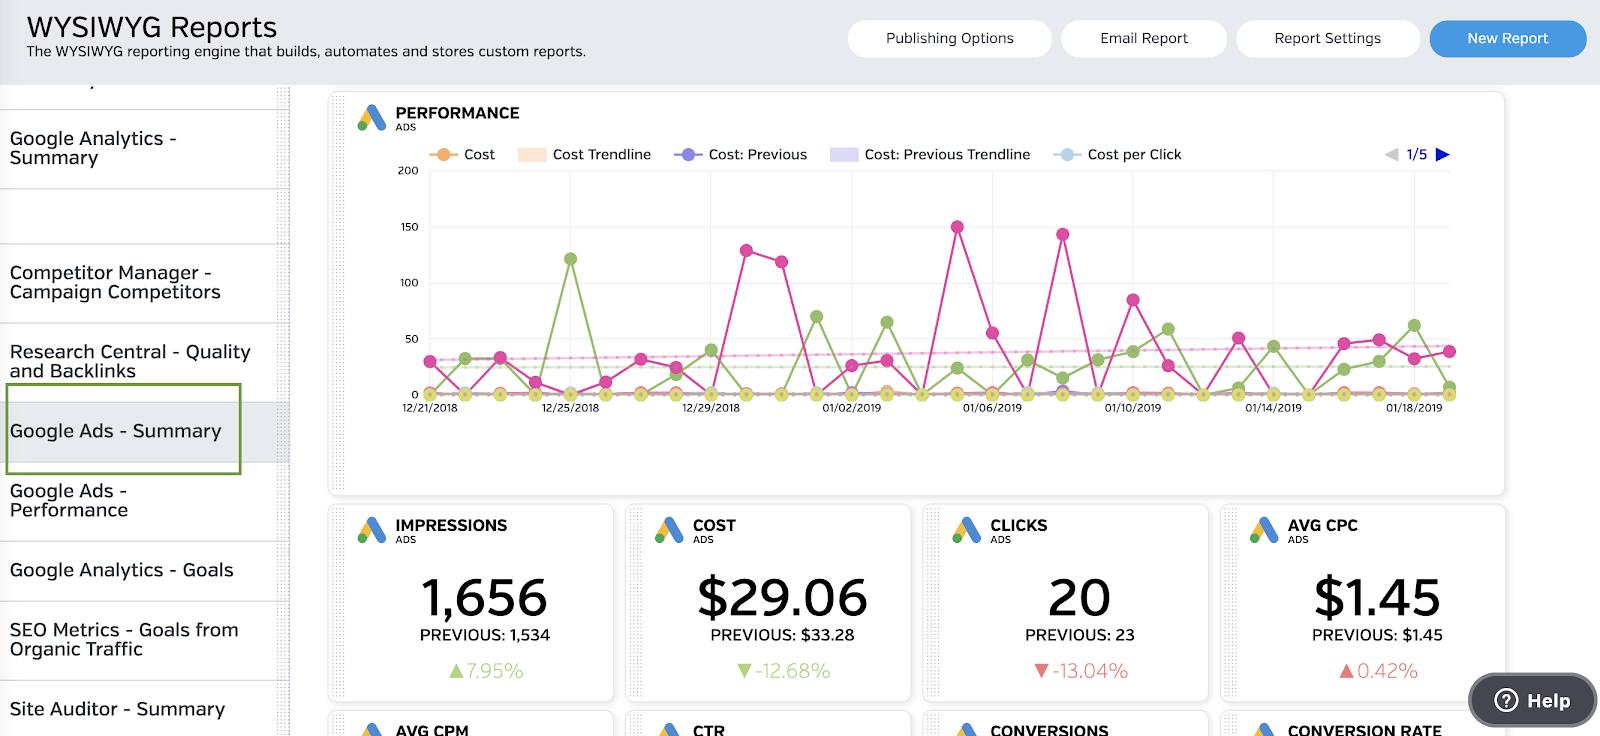 WYSIWYG Reports within Raven Tools: Google Ads Summary